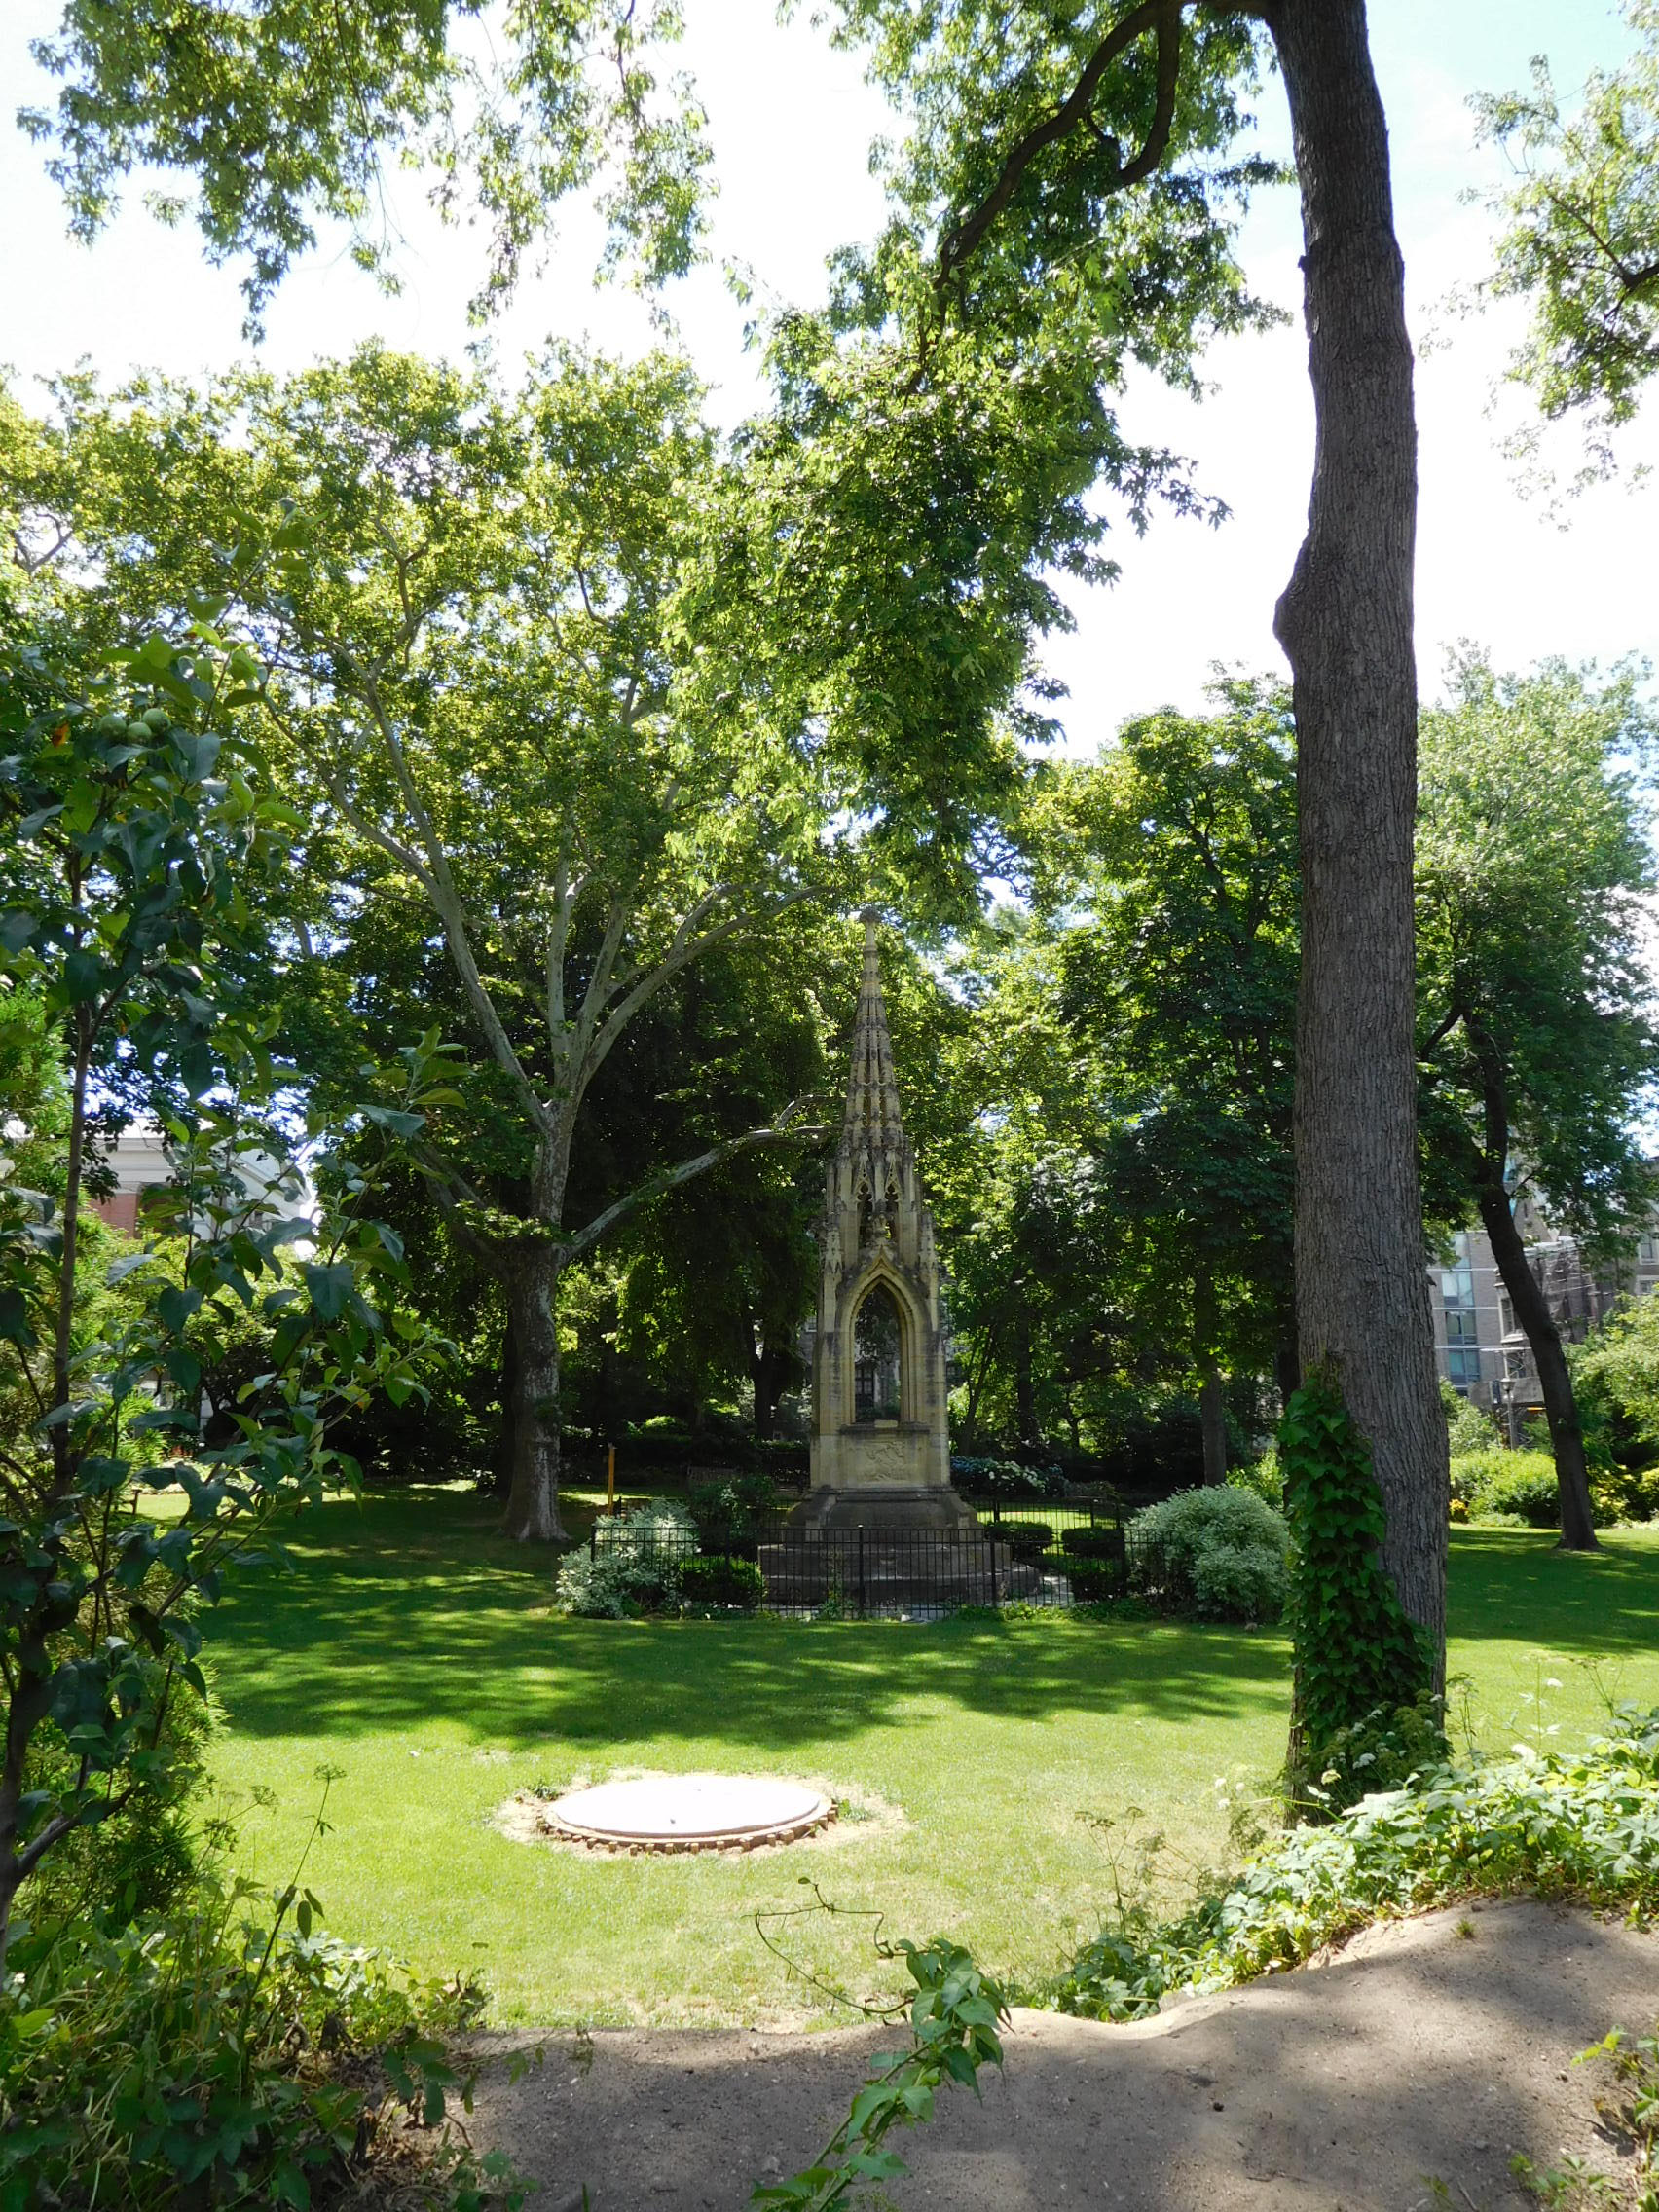 ^ 111th Street People's Garden